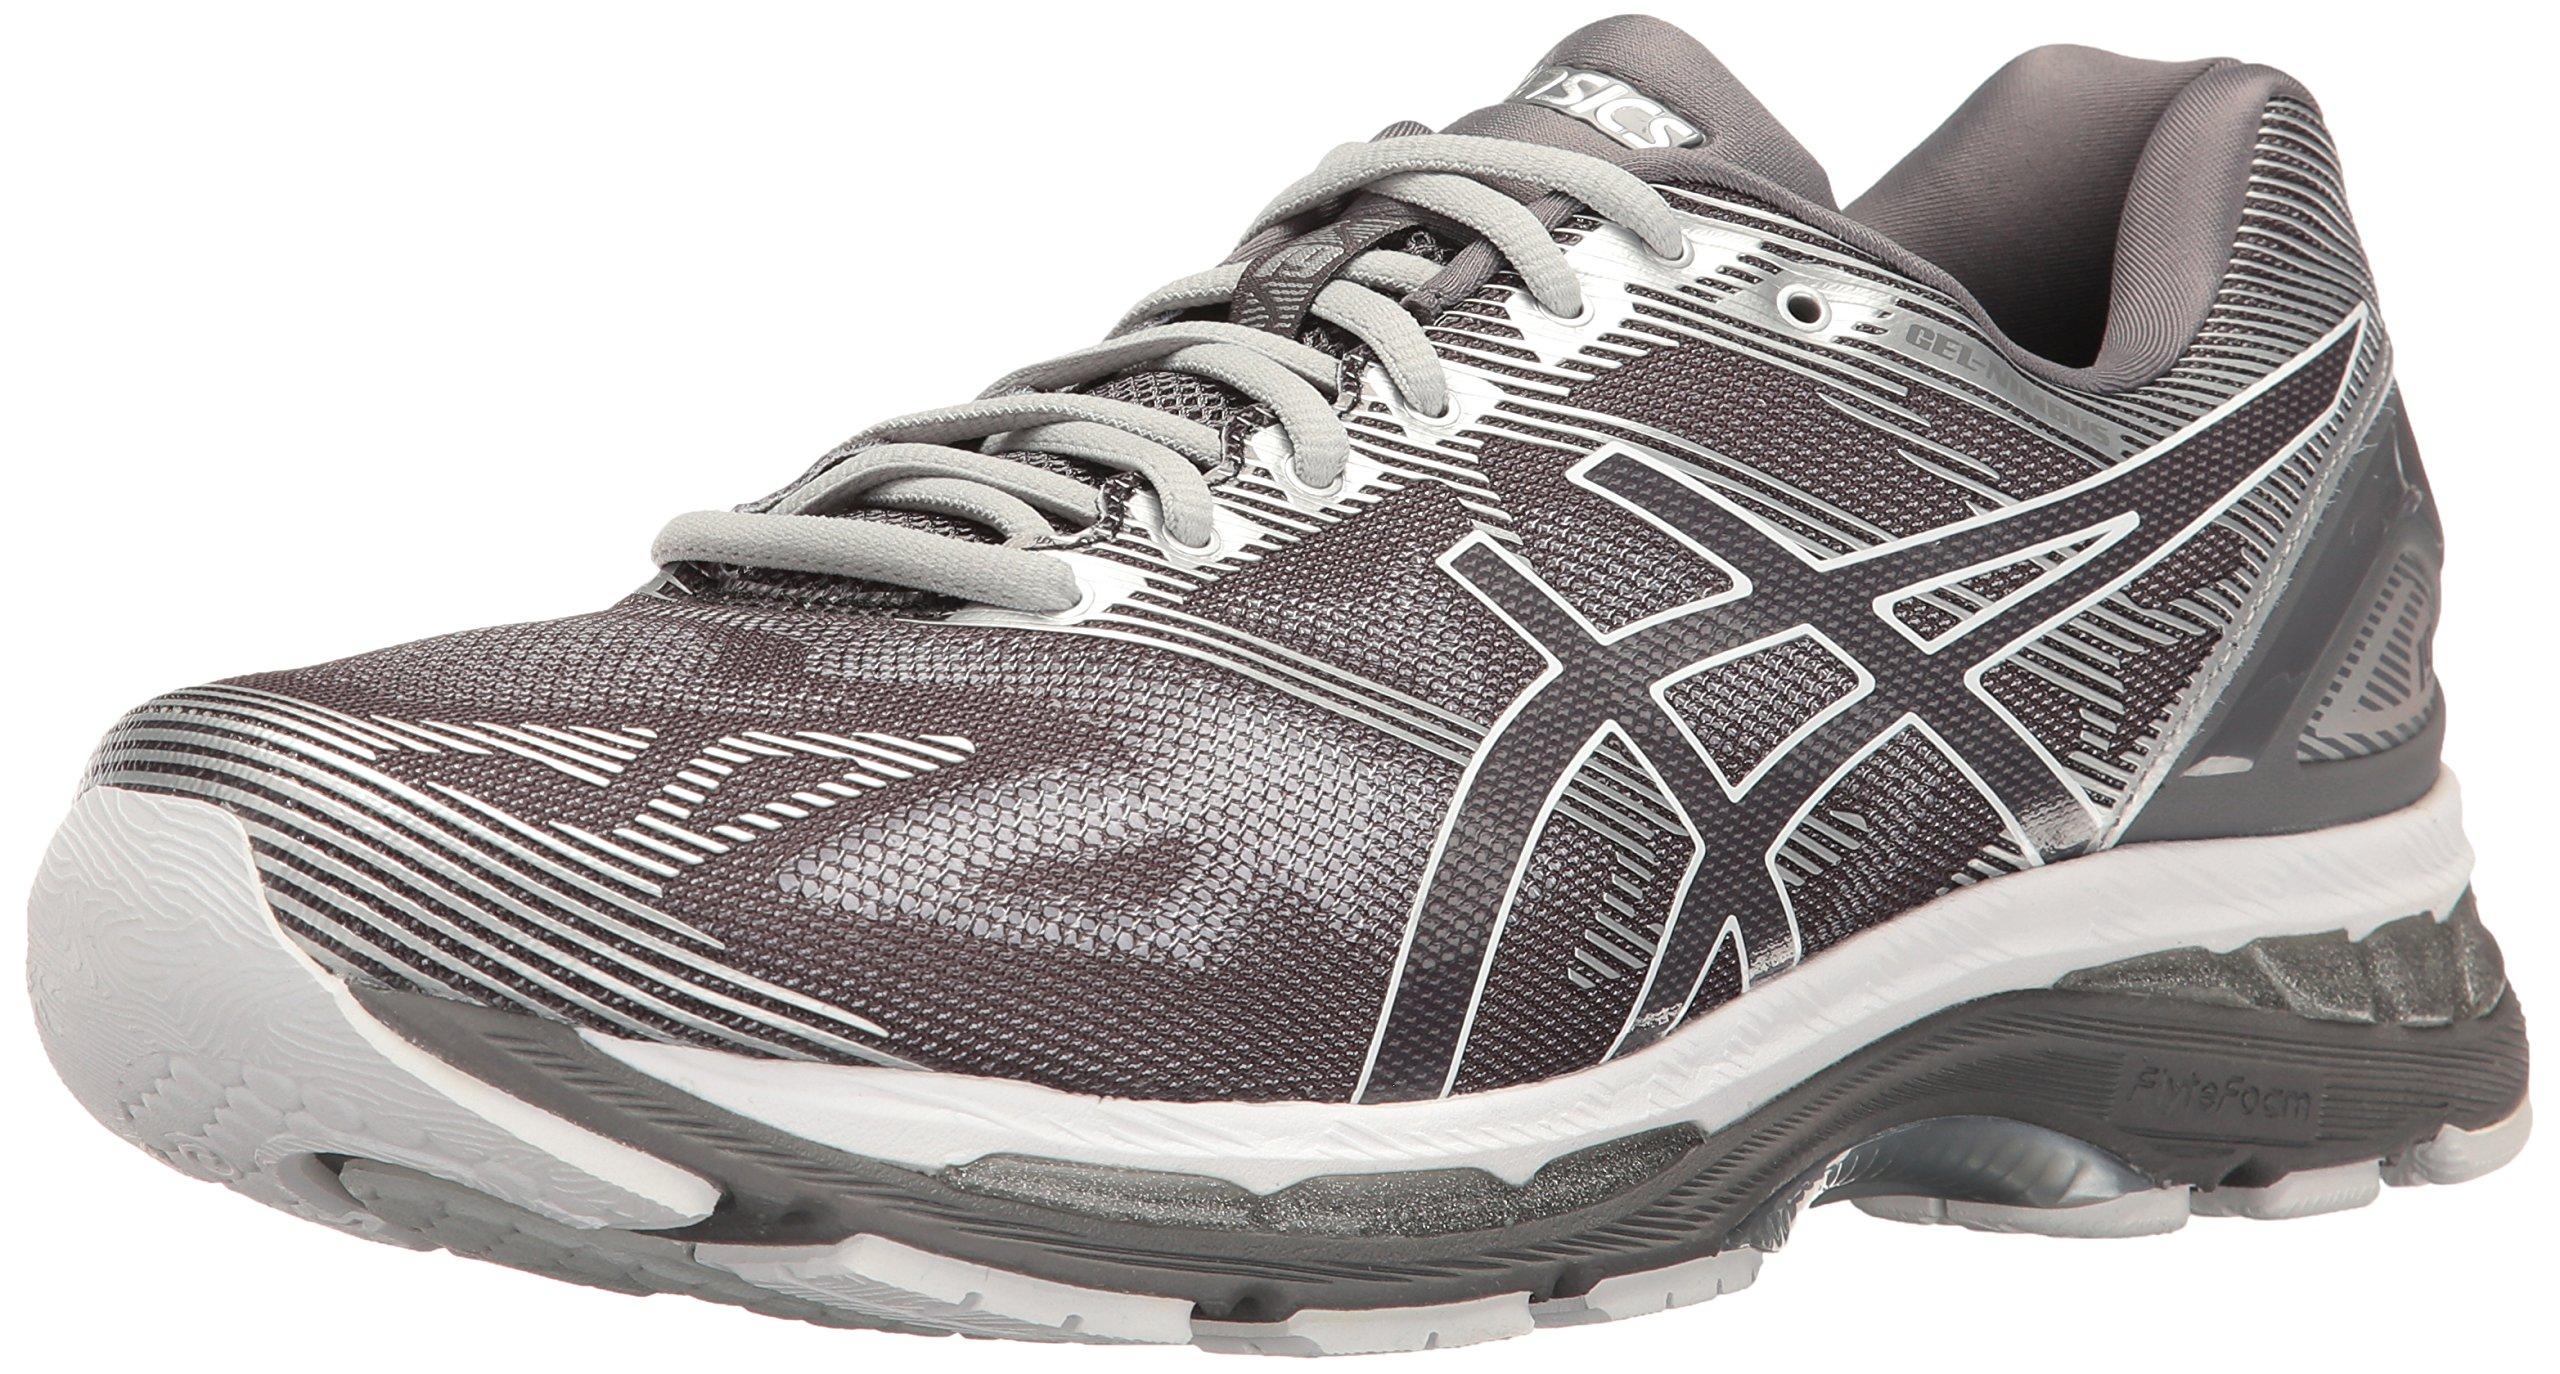 low priced 58d1e c3ac5 ASICS Men's Gel-Nimbus 19 Running Shoe, Carbon/White/Silver, 14 4E US